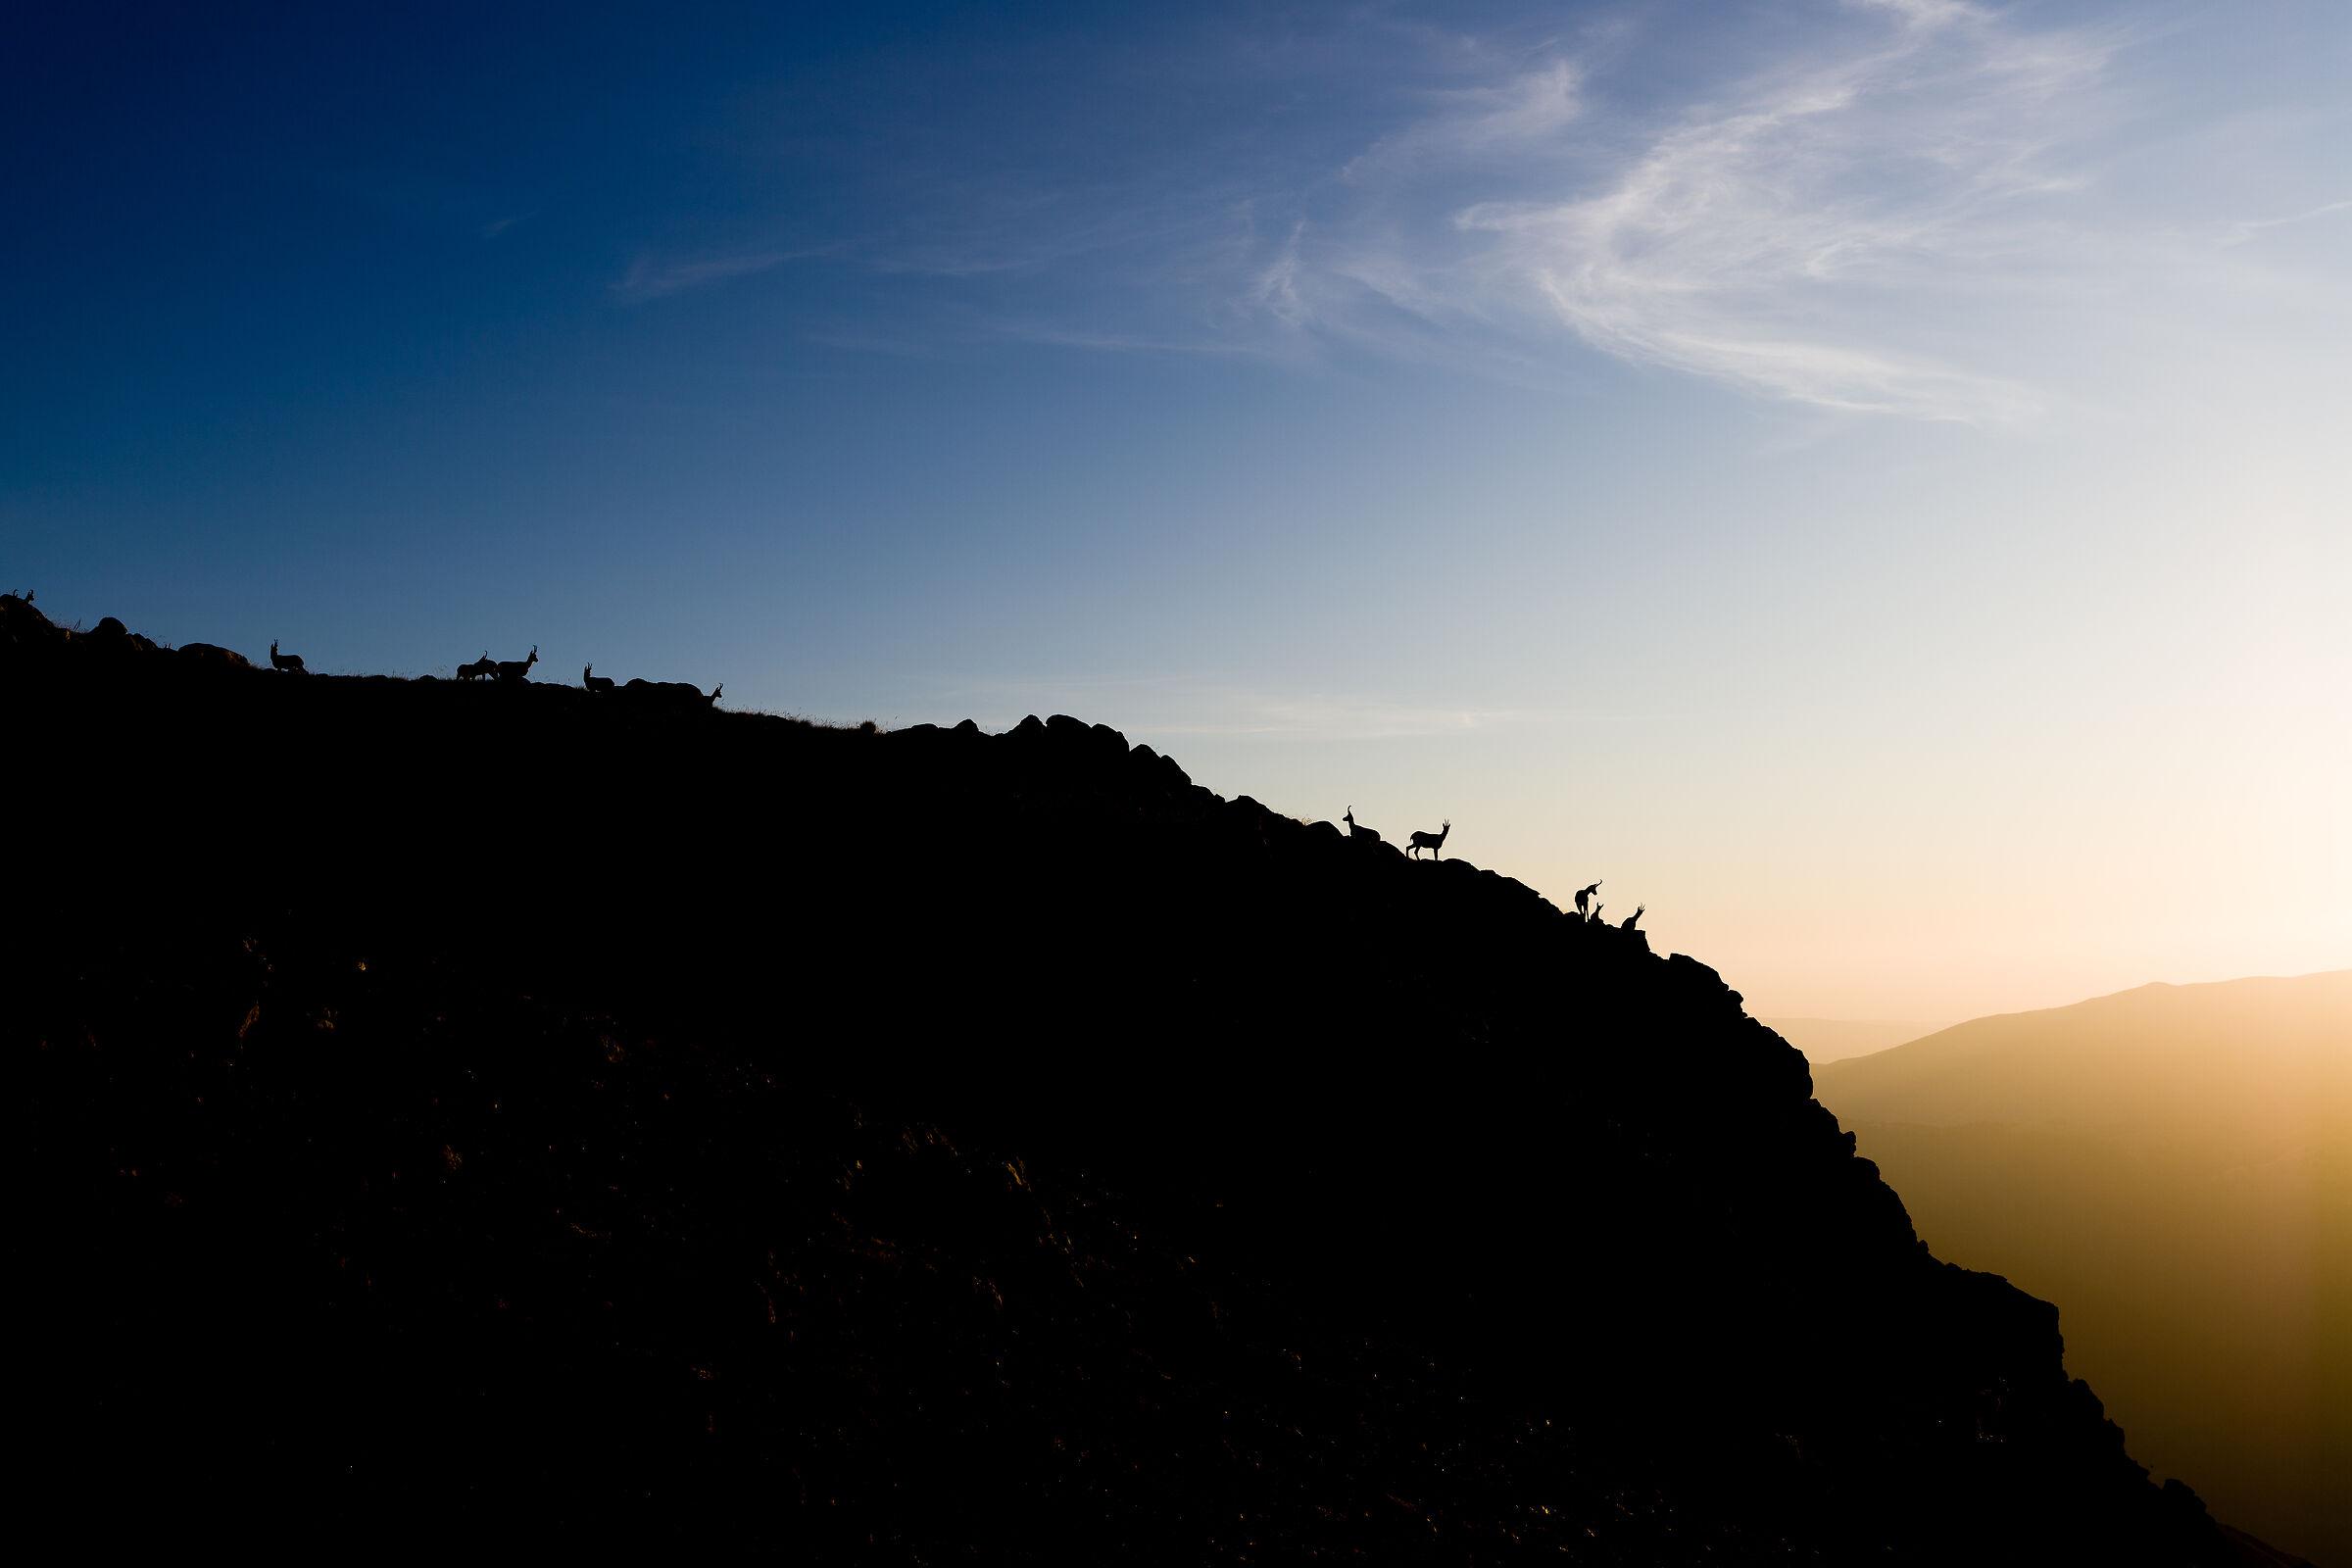 Camosci on the horizon...